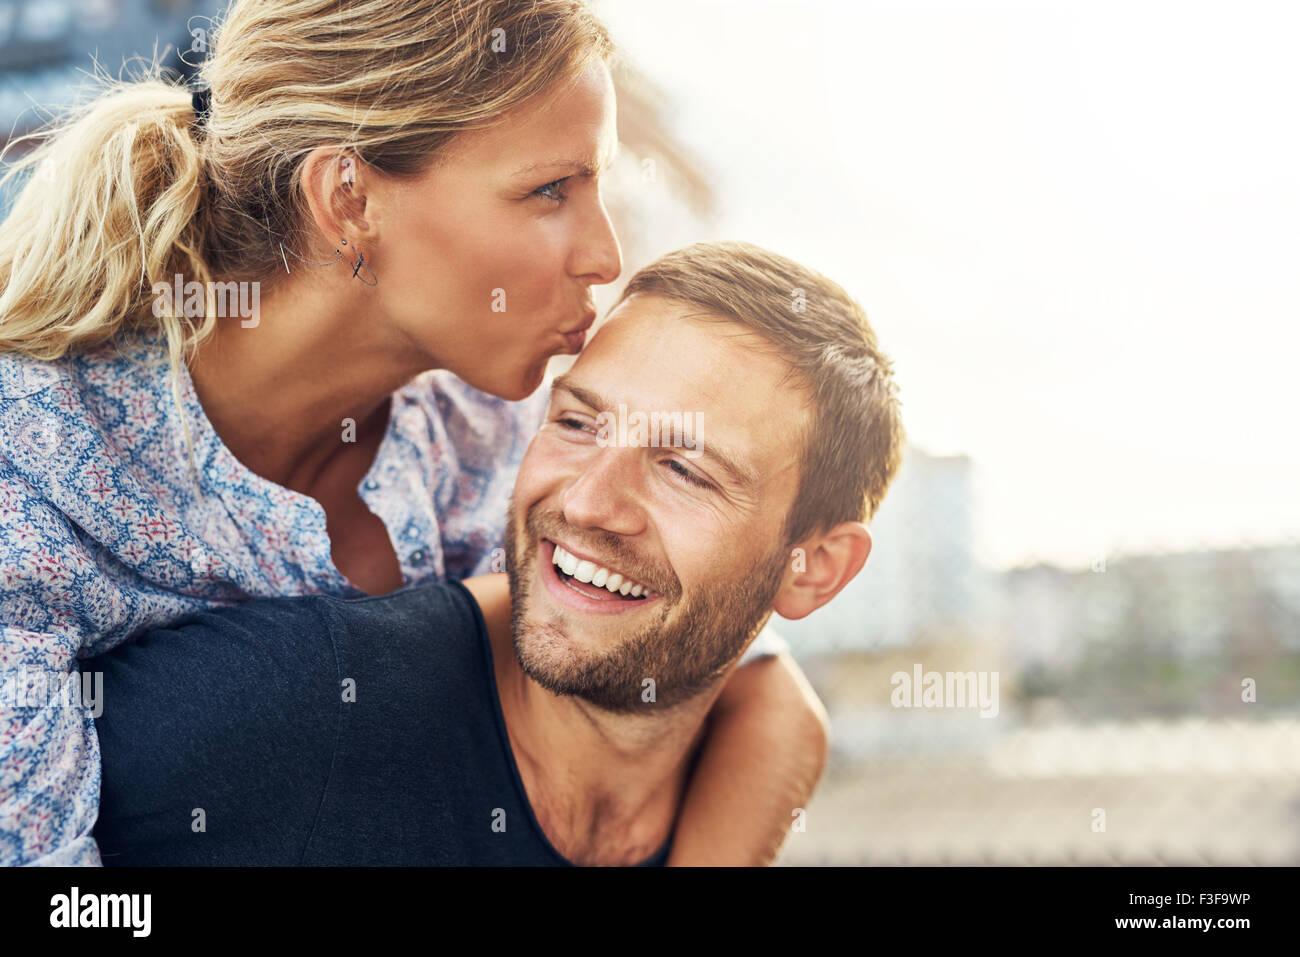 Woman Kissing Man alors qu'il rit, jeune couple Photo Stock